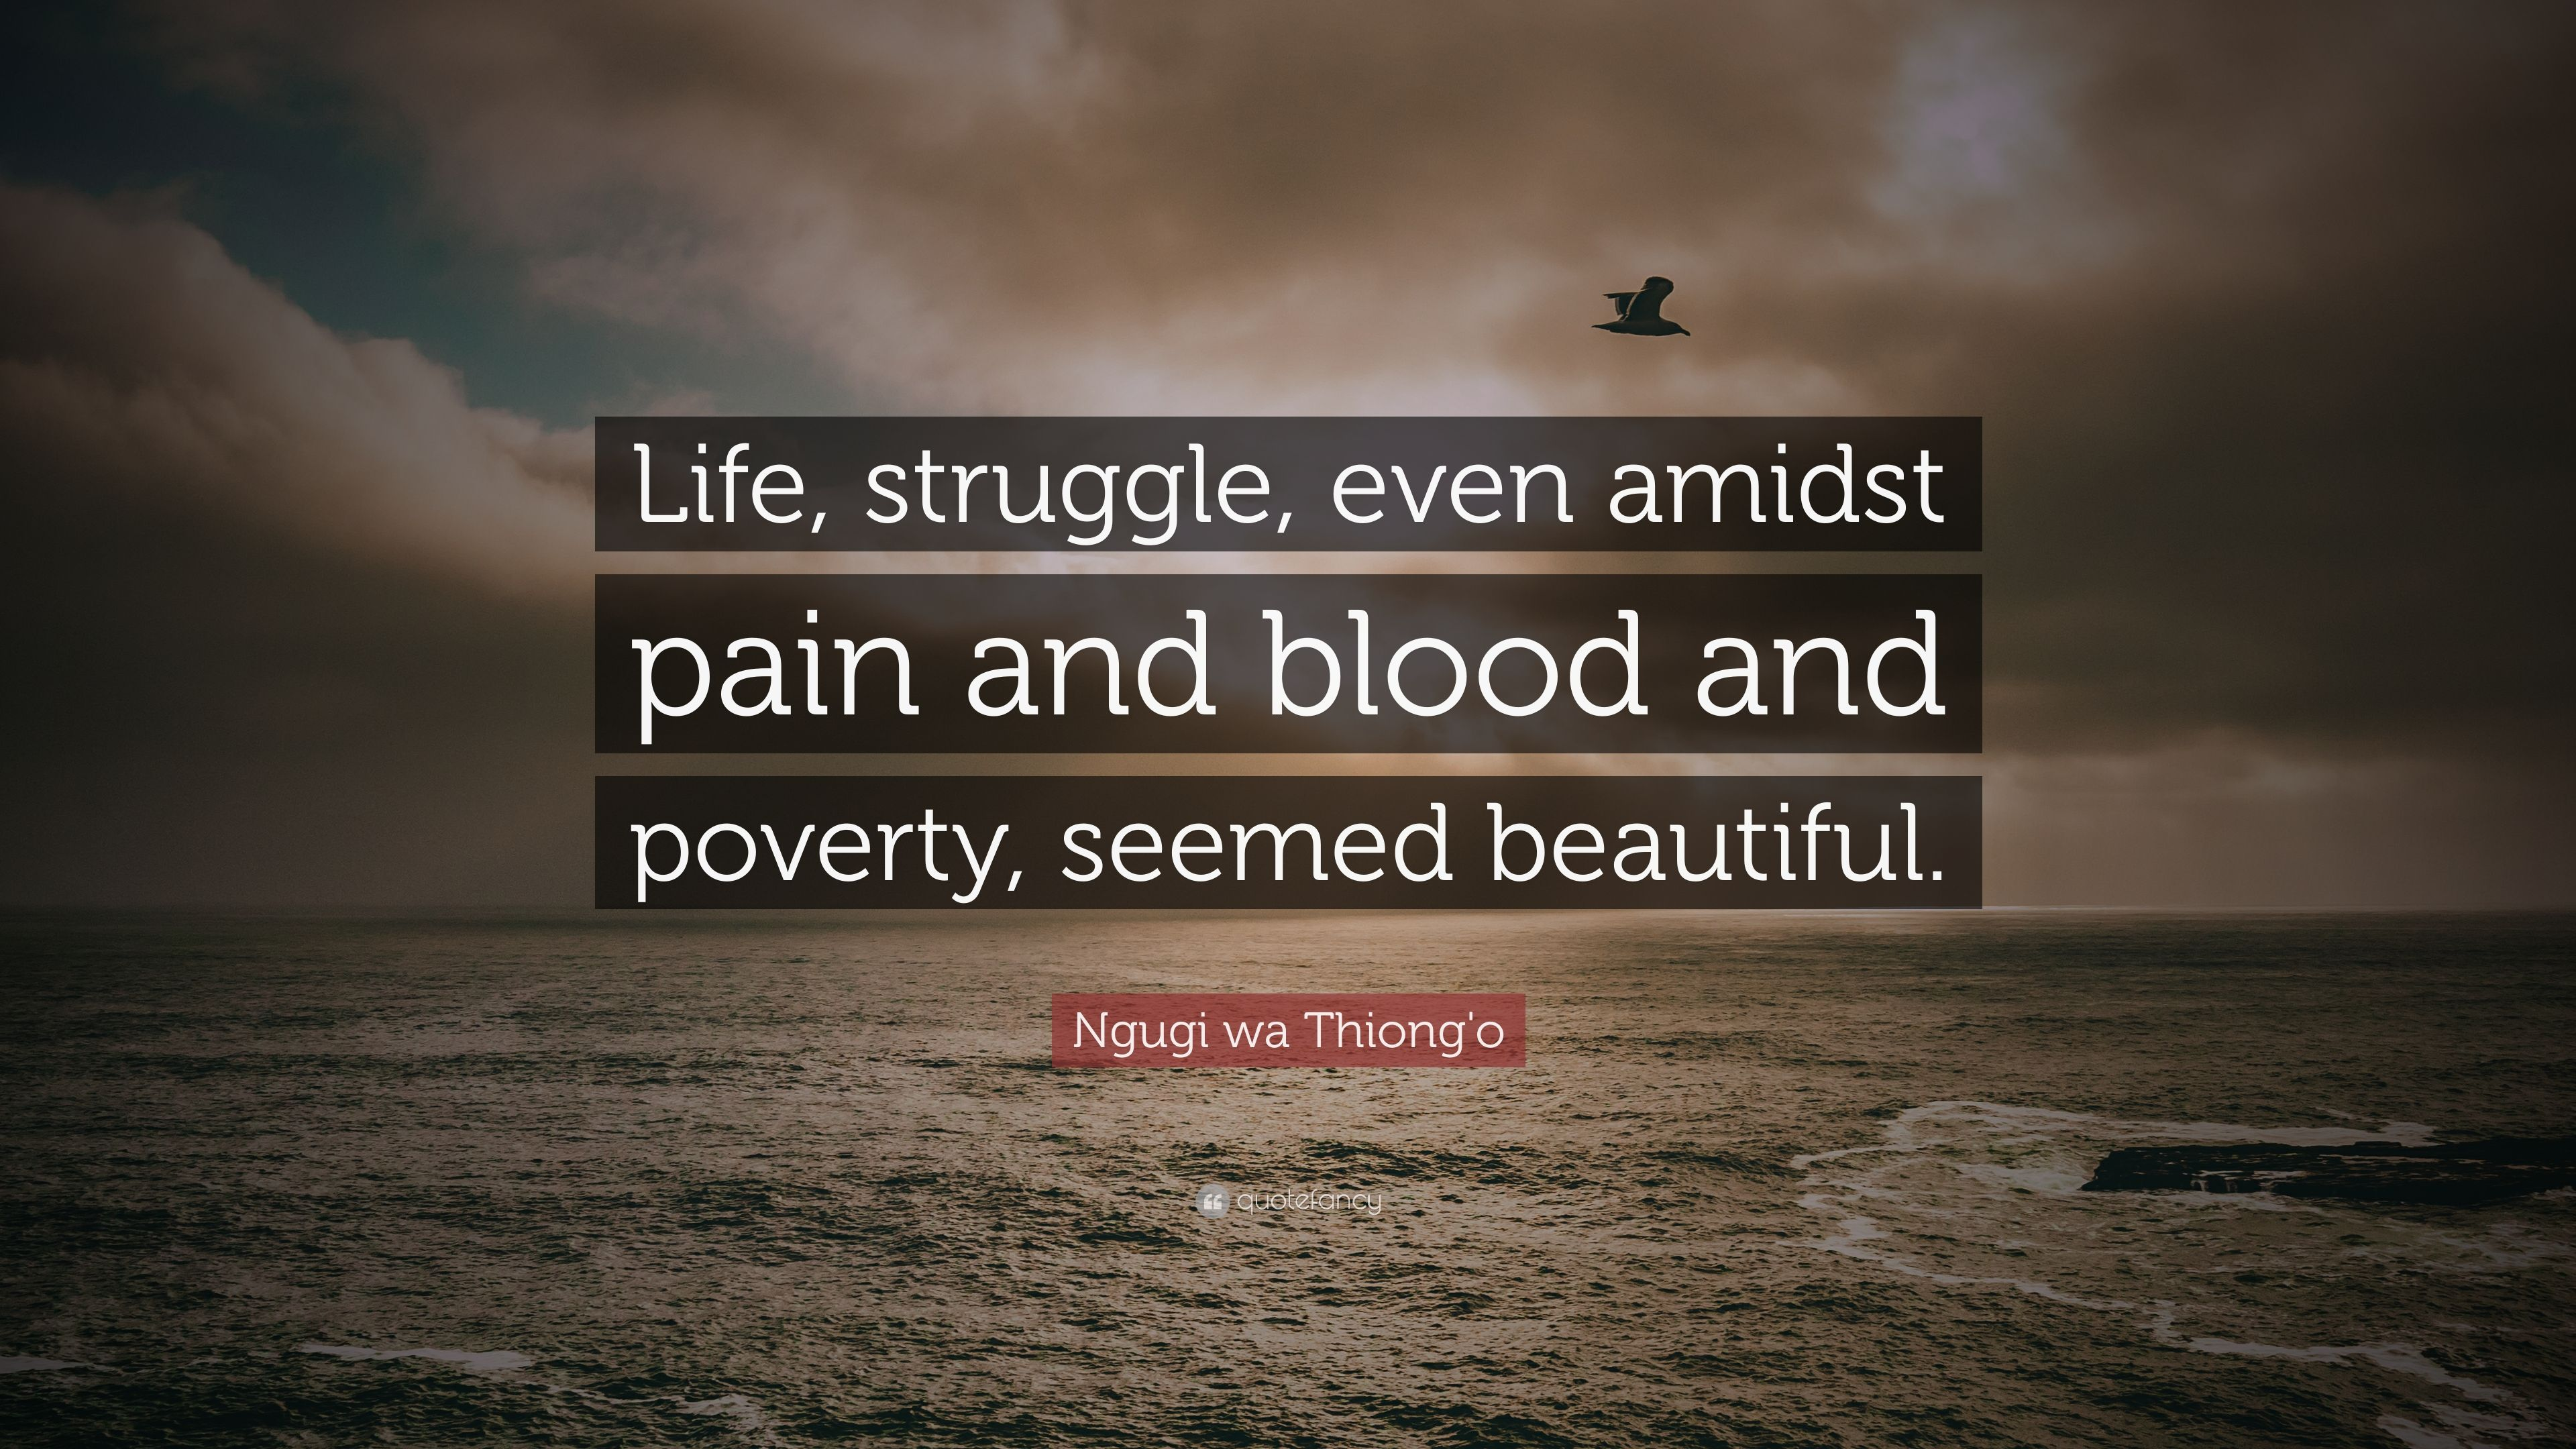 Ngugi Wa Thiongo Quote Life Struggle Even Amidst Pain And Blood